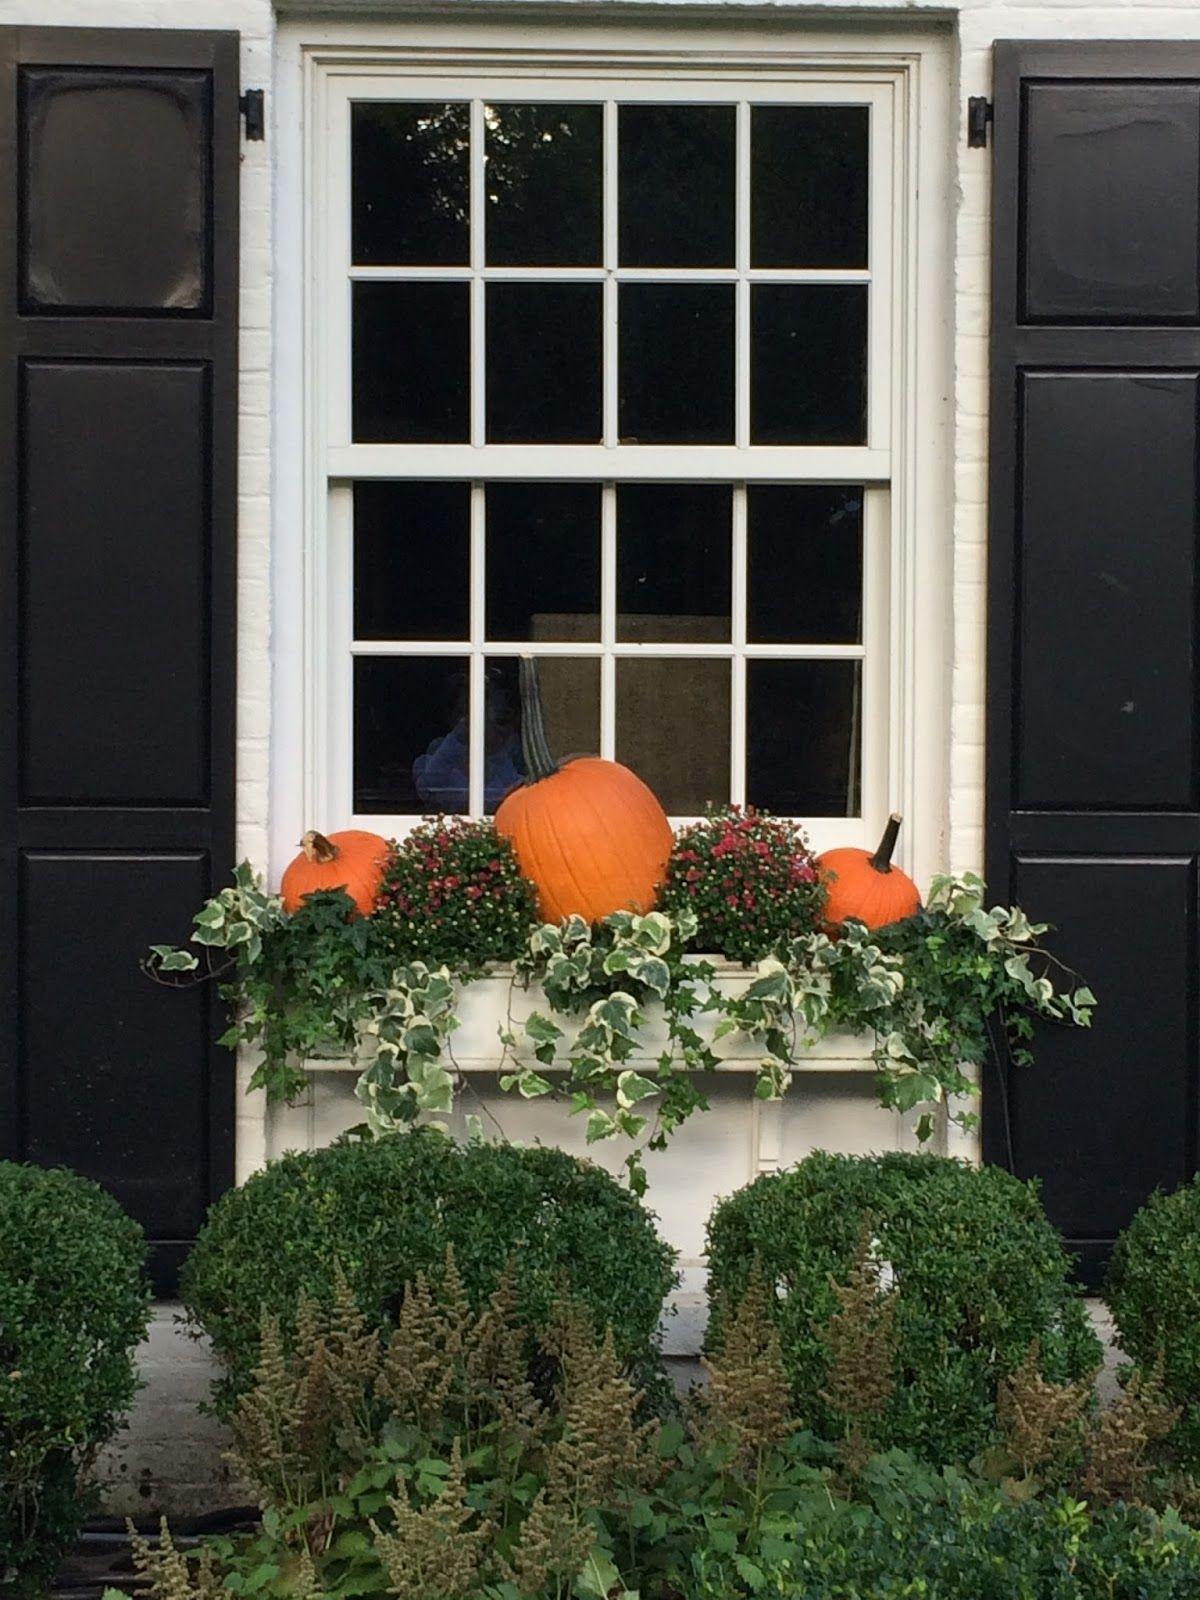 IMG_7286.JPG 1,200×1,600 pixels Window box flowers, Fall